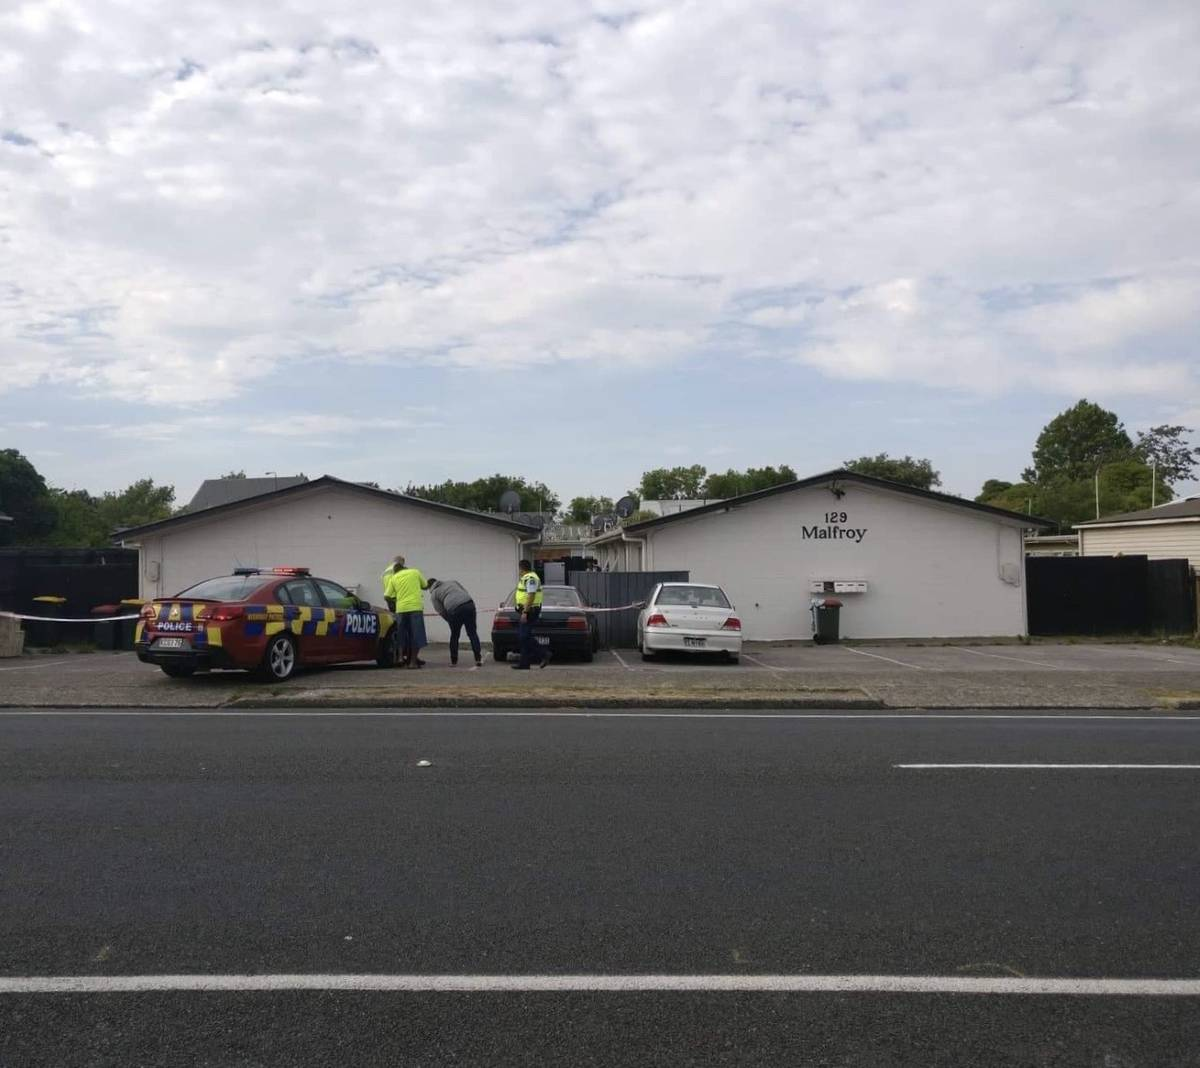 Man dies following alleged Malfroy Rd assault in Rotorua